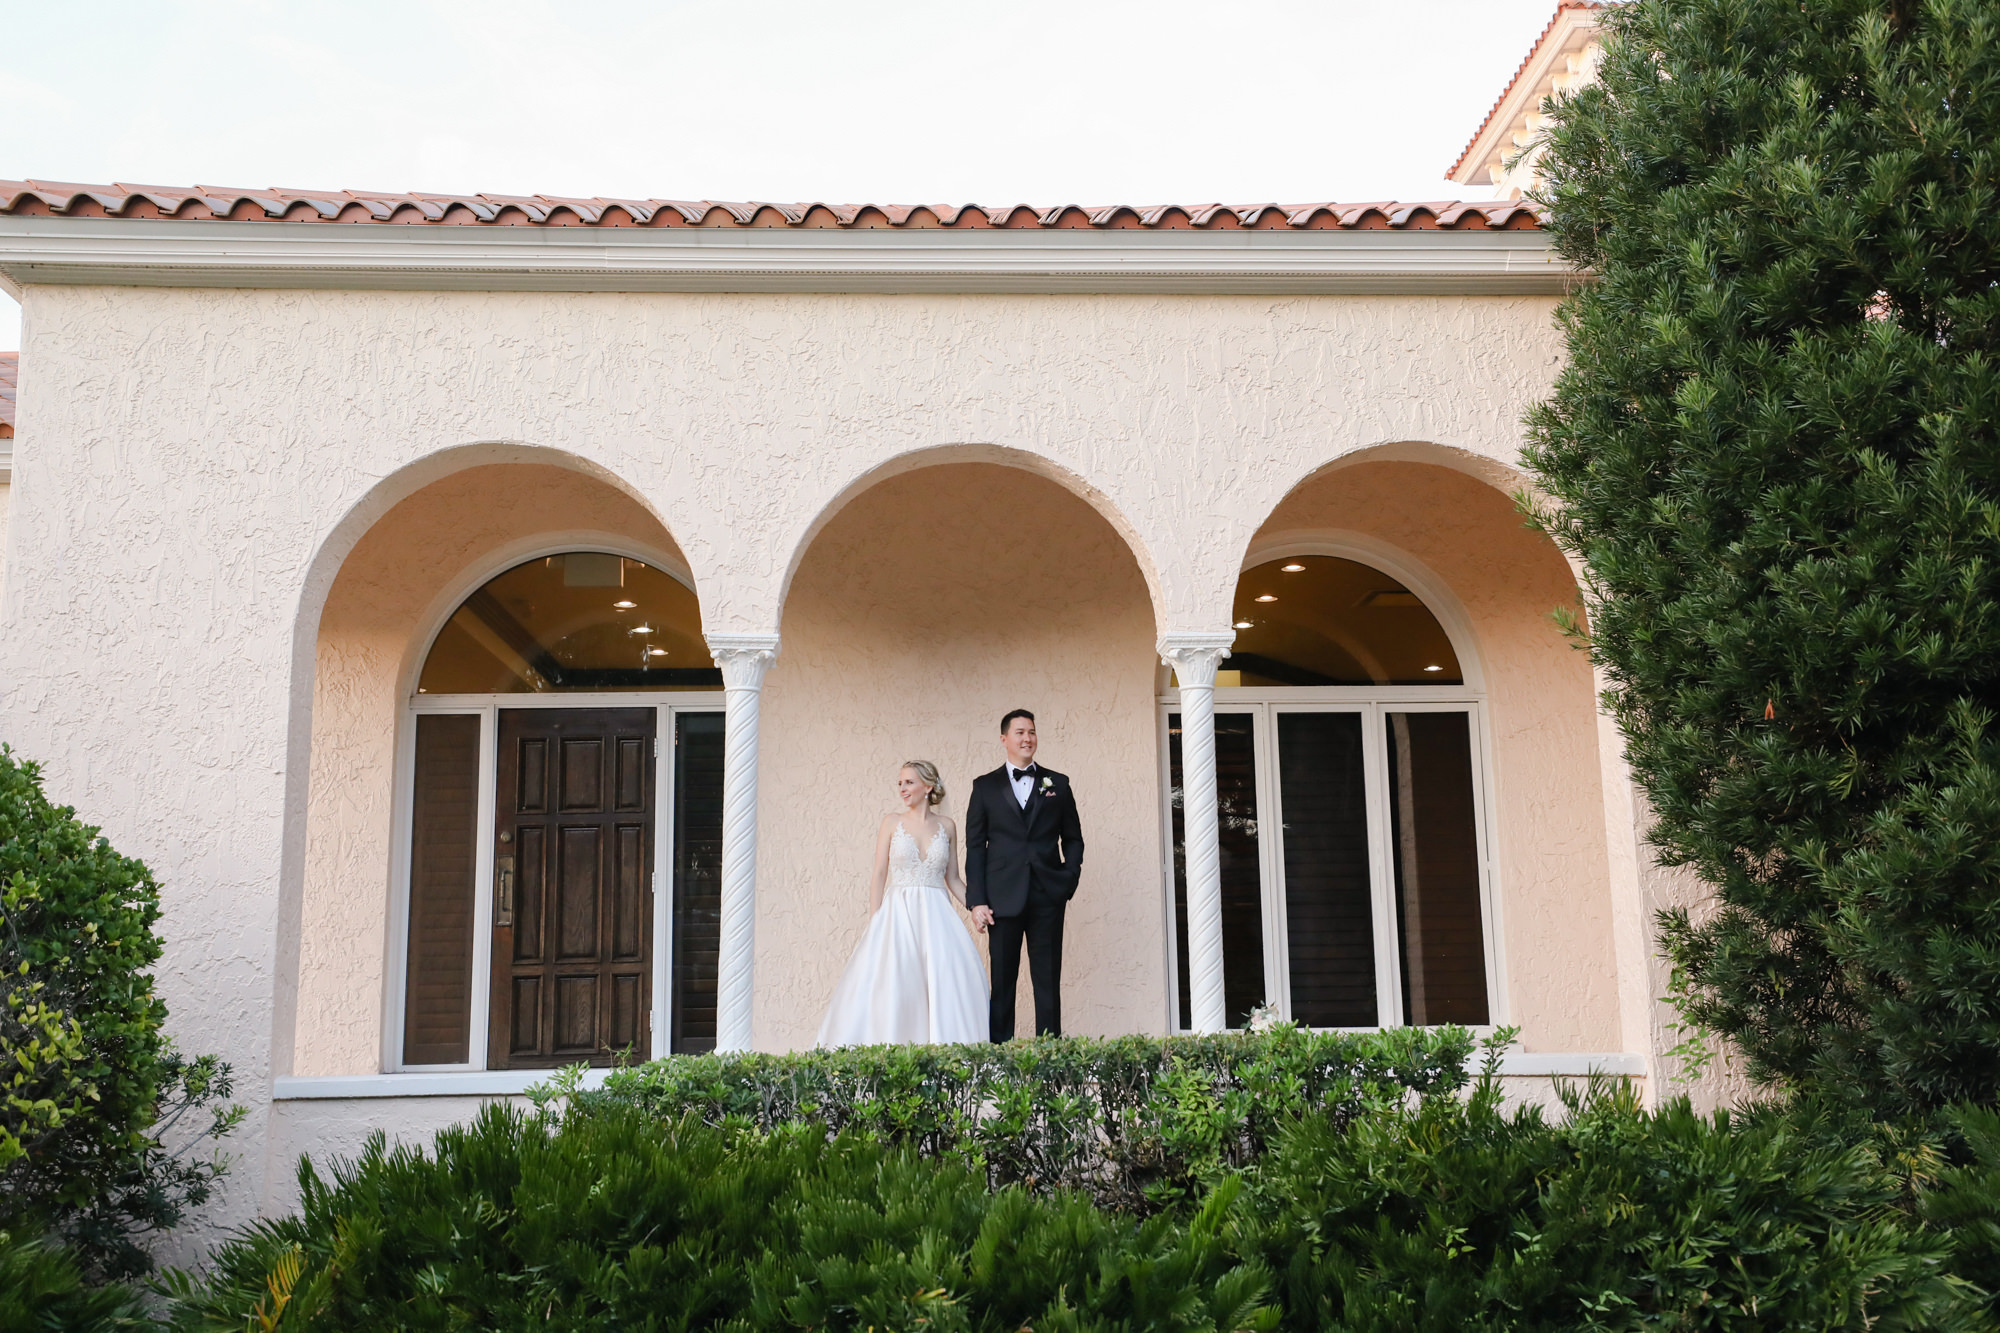 Tampa Wedding Venue Avila Golf & Country Club | Bride and Groom Outdoor Garden Portrait | Tampa Bay Wedding Photographer Lifelong Photography Studio